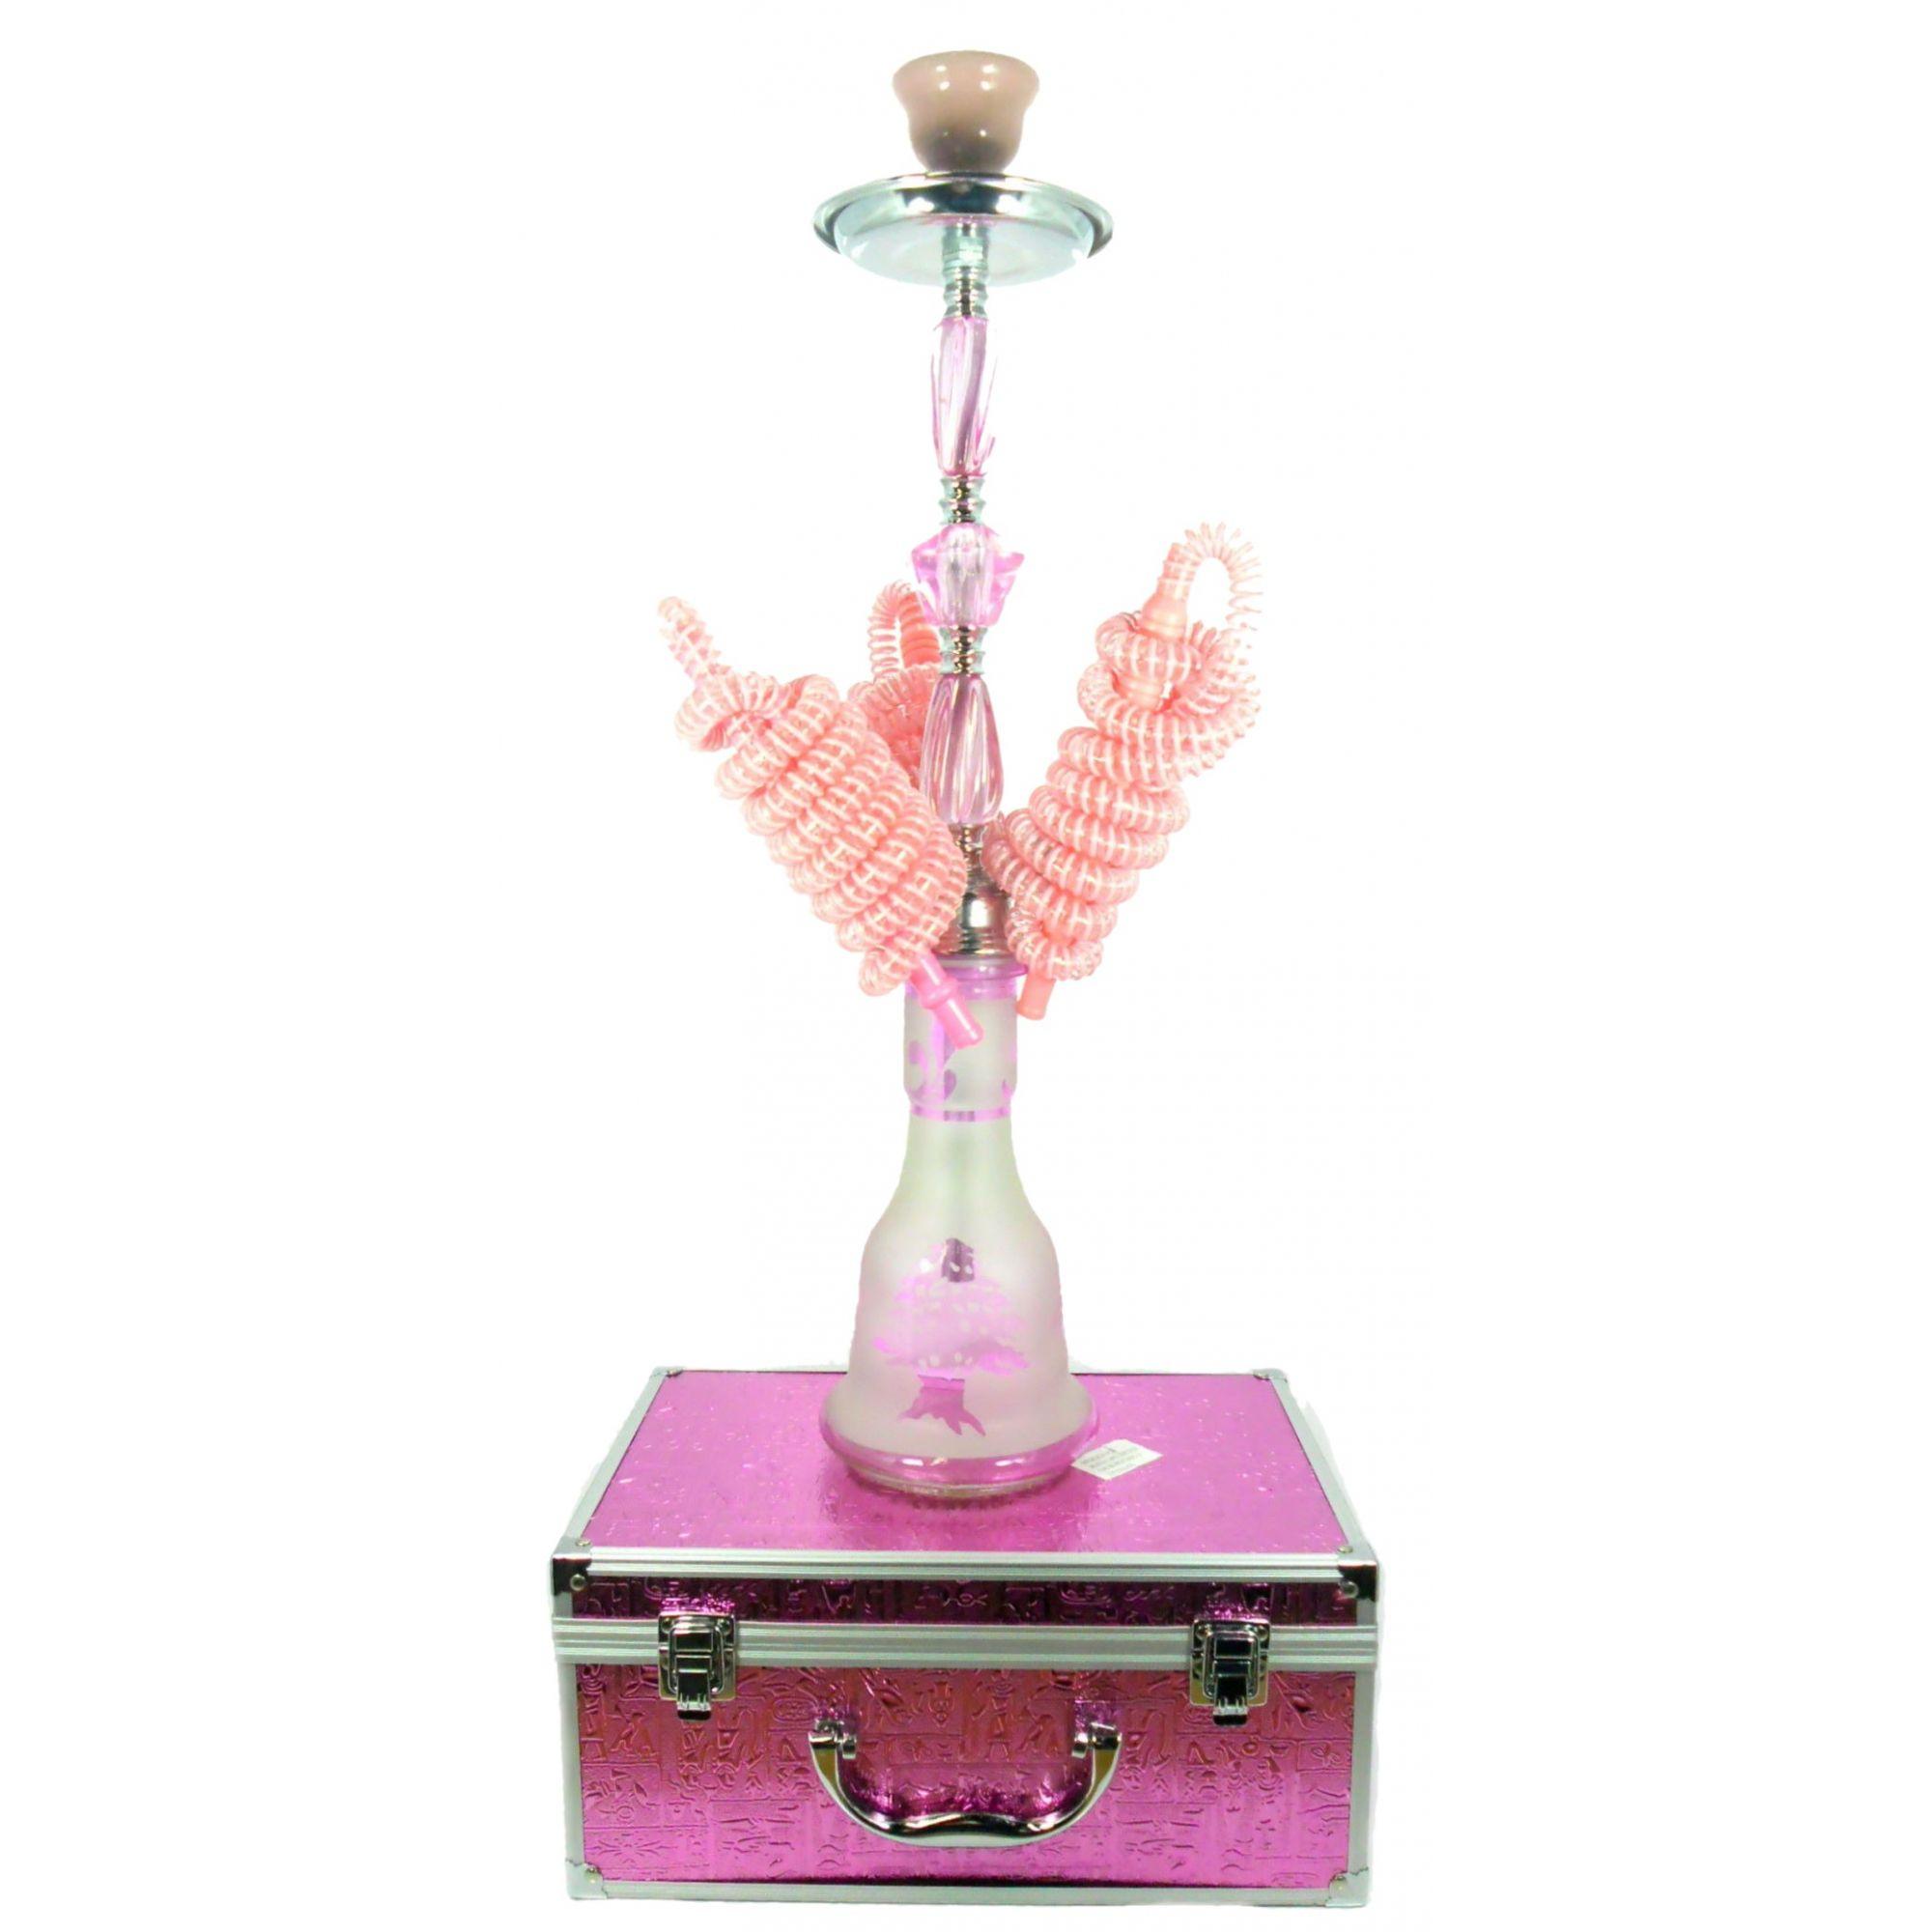 Narguile MD Hookah 55cm COM MALETA. Três mangueiras, vidro ROSA jateado, corpo cromado AB543SMALRS